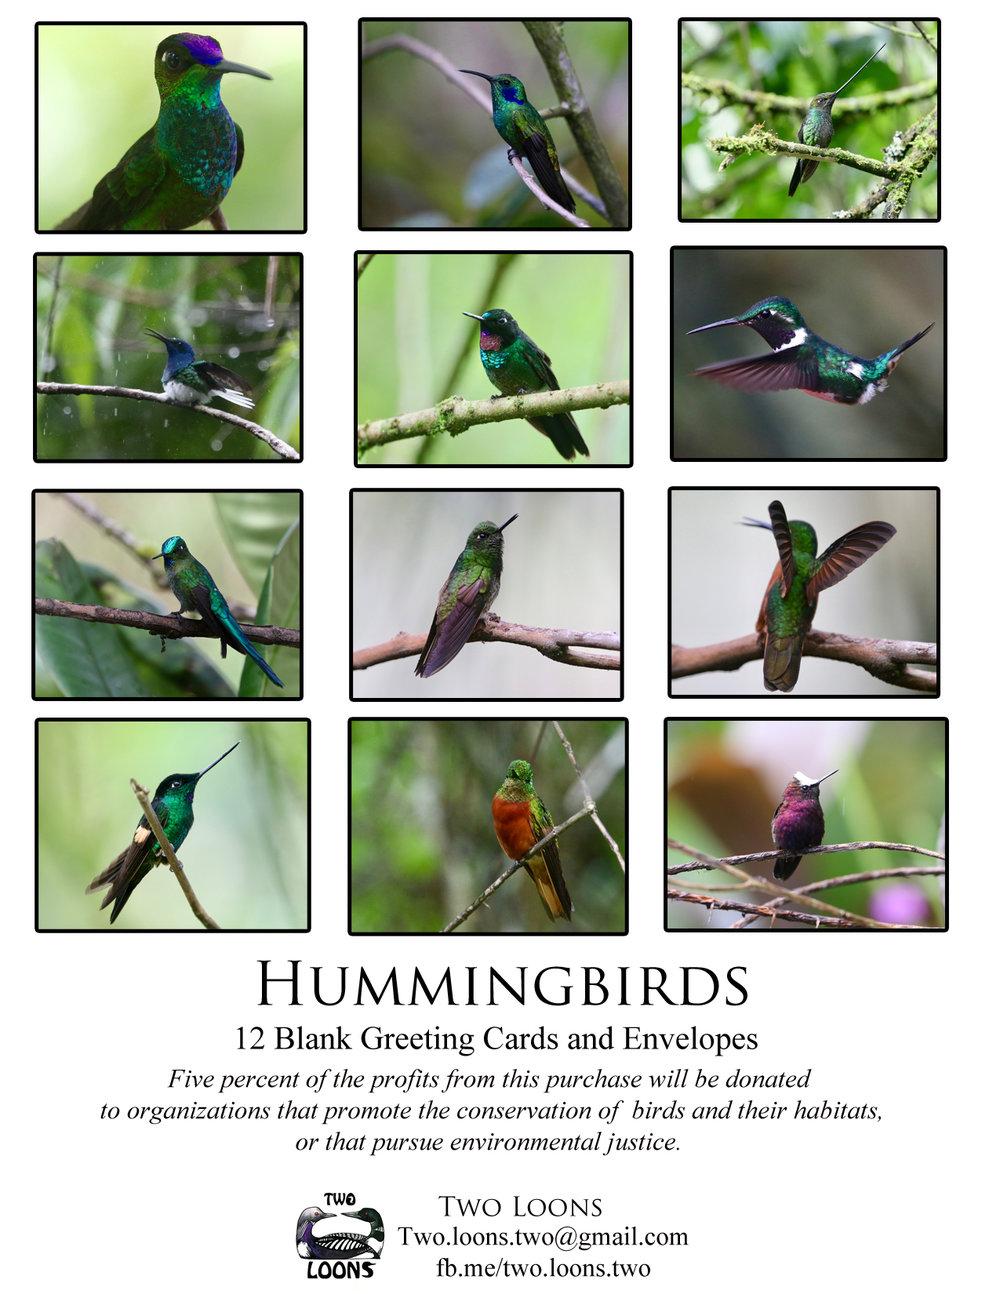 HUMMINGBIRD info.jpg